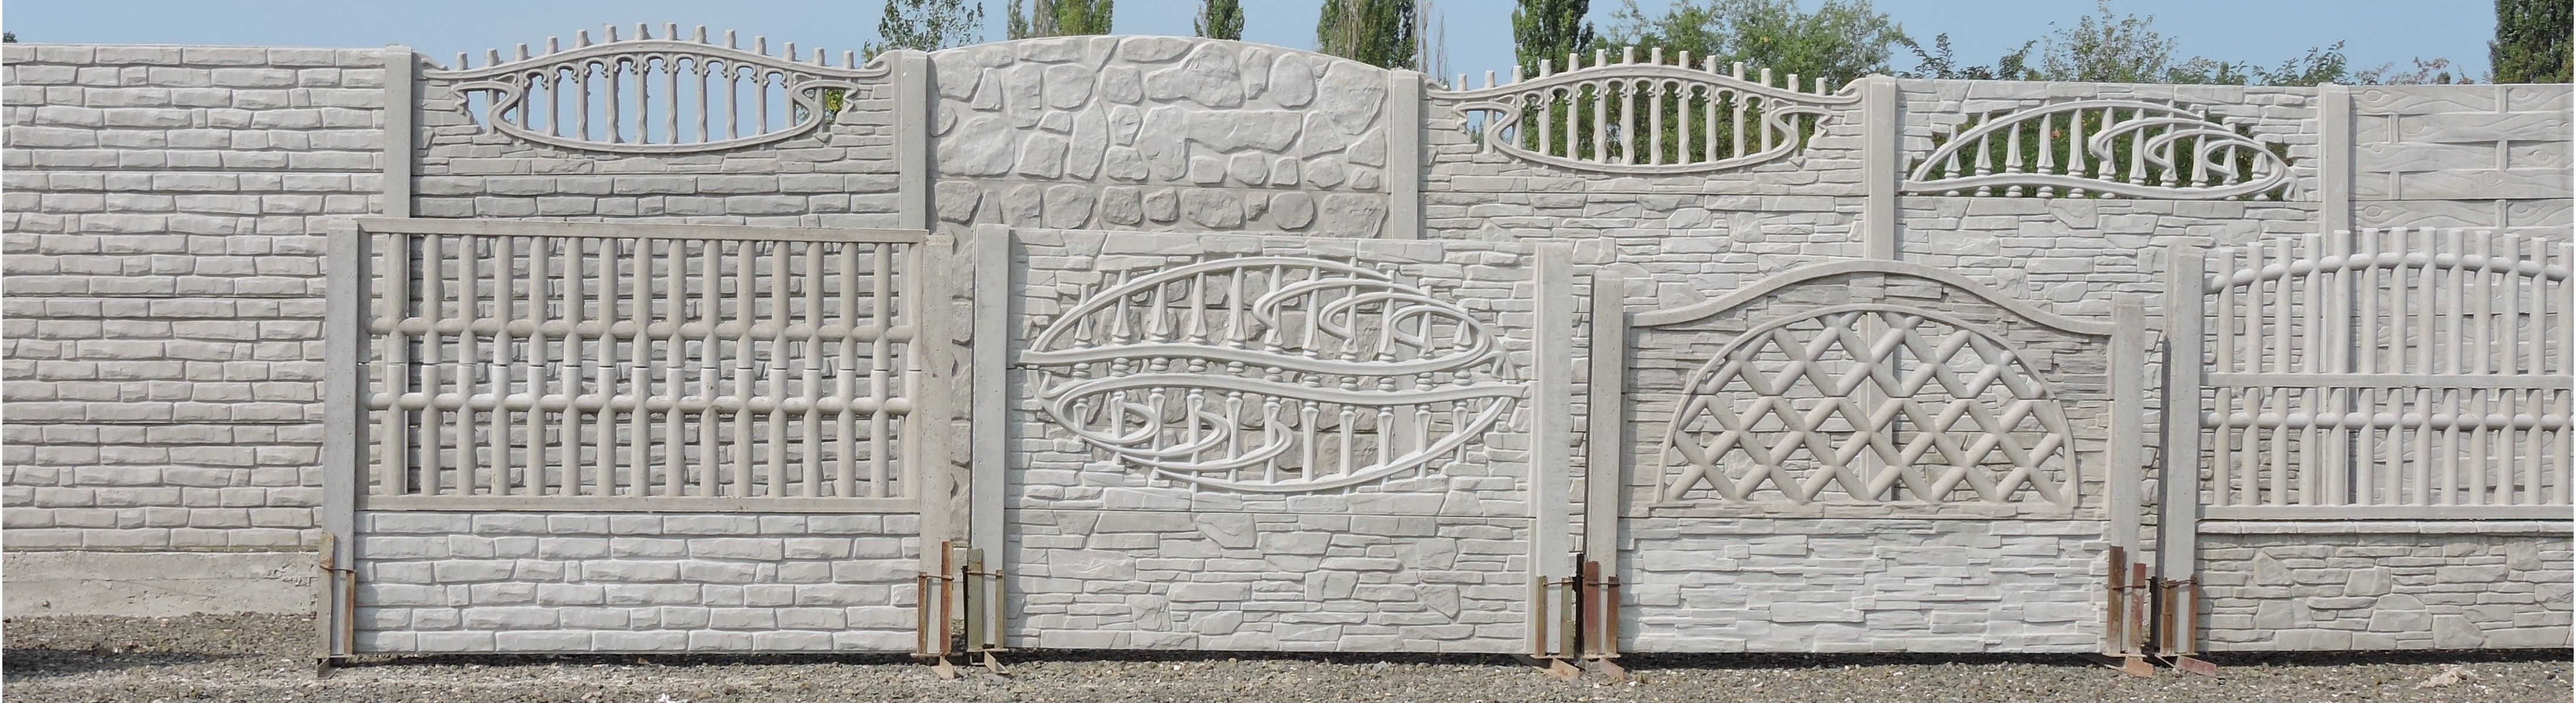 Gard de placi din beton armat